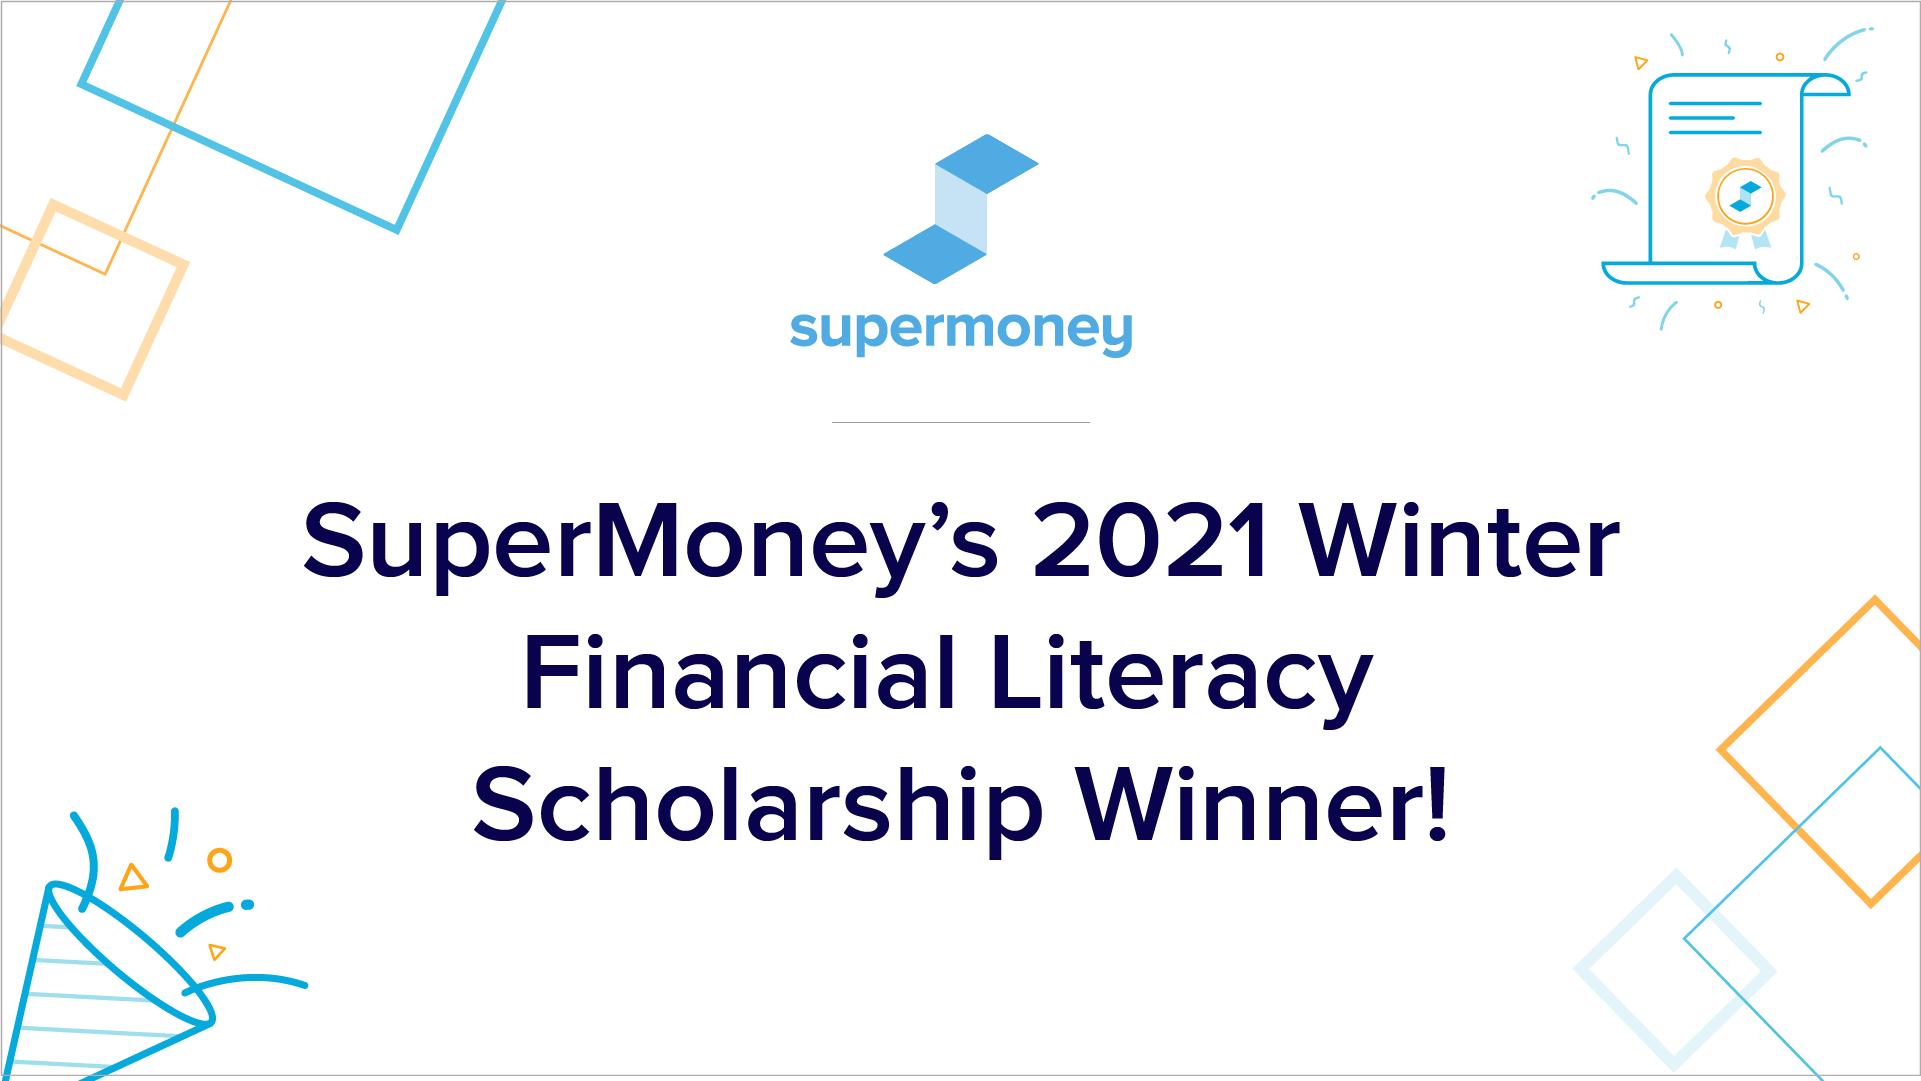 SuperMoney's 2021 Winter Financial Literacy Scholarship Winner | SuperMoney!